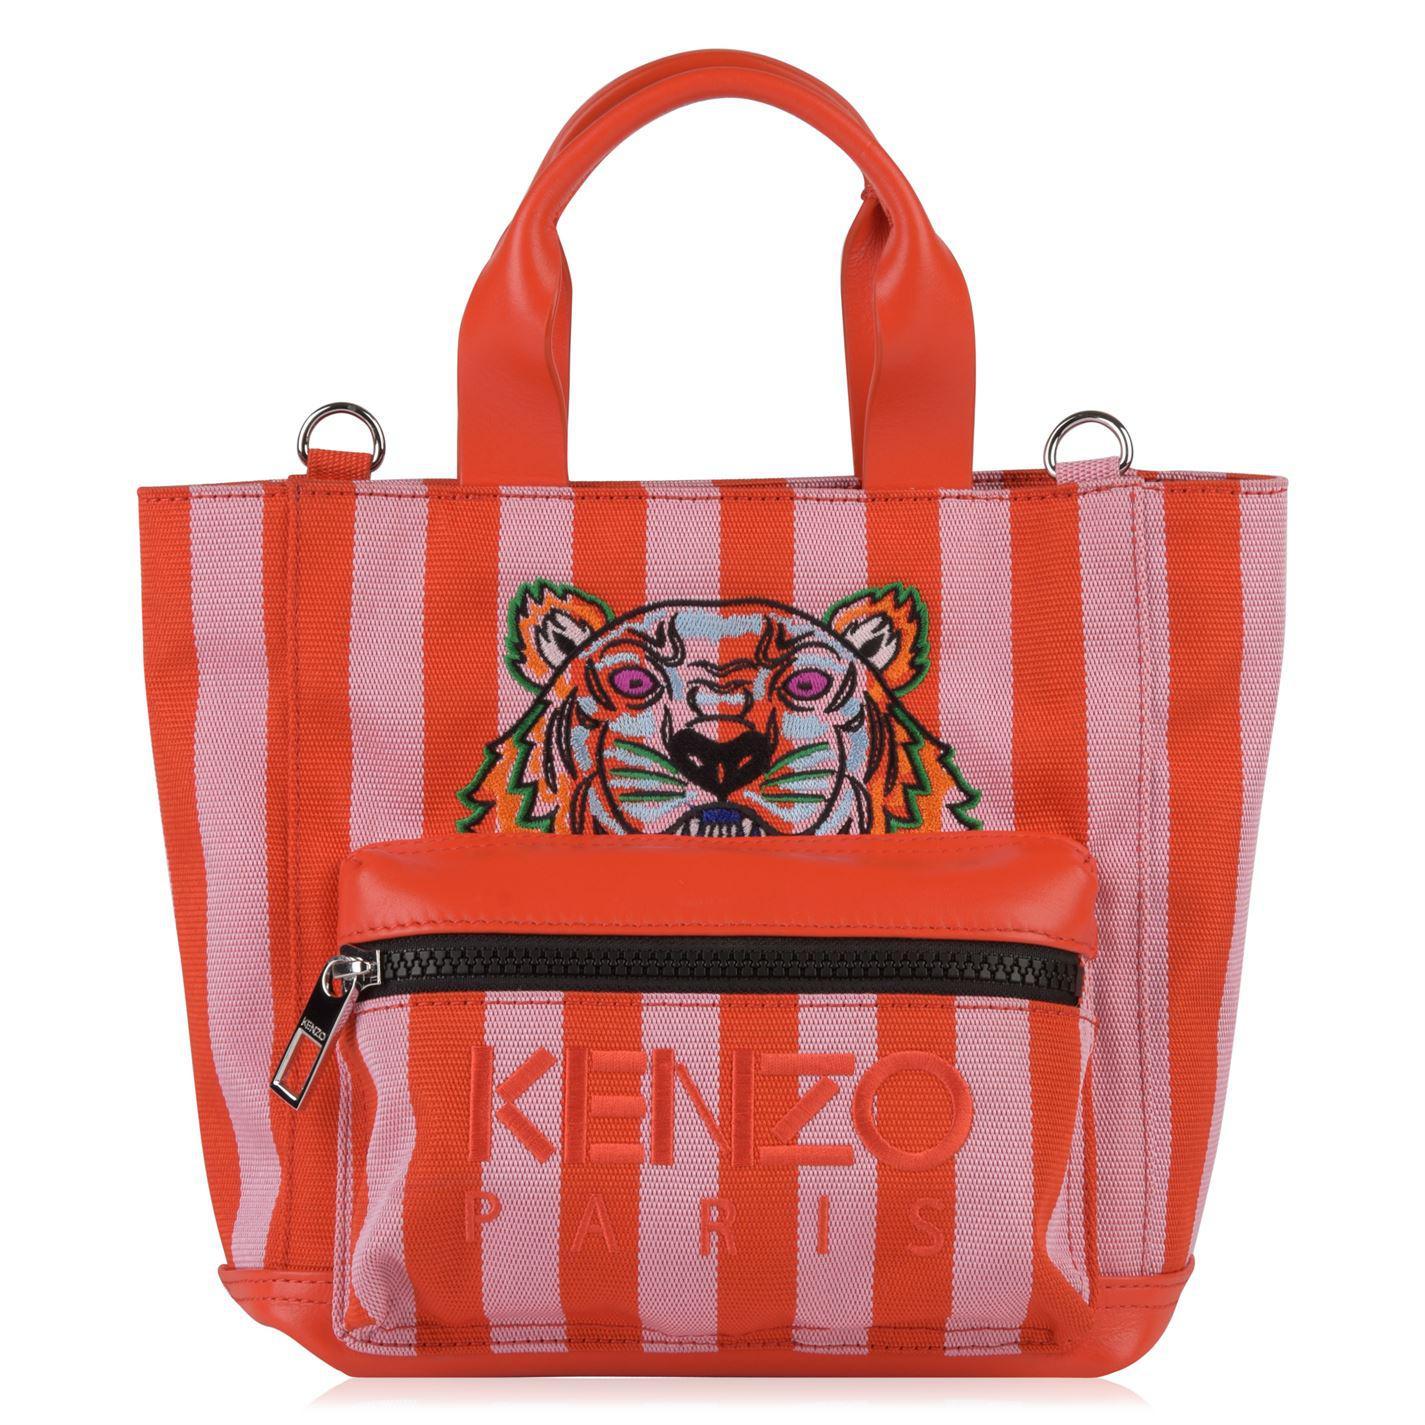 Kenzo Tiger Mini Tote Bag in Red - Lyst 0372e7d8dd708